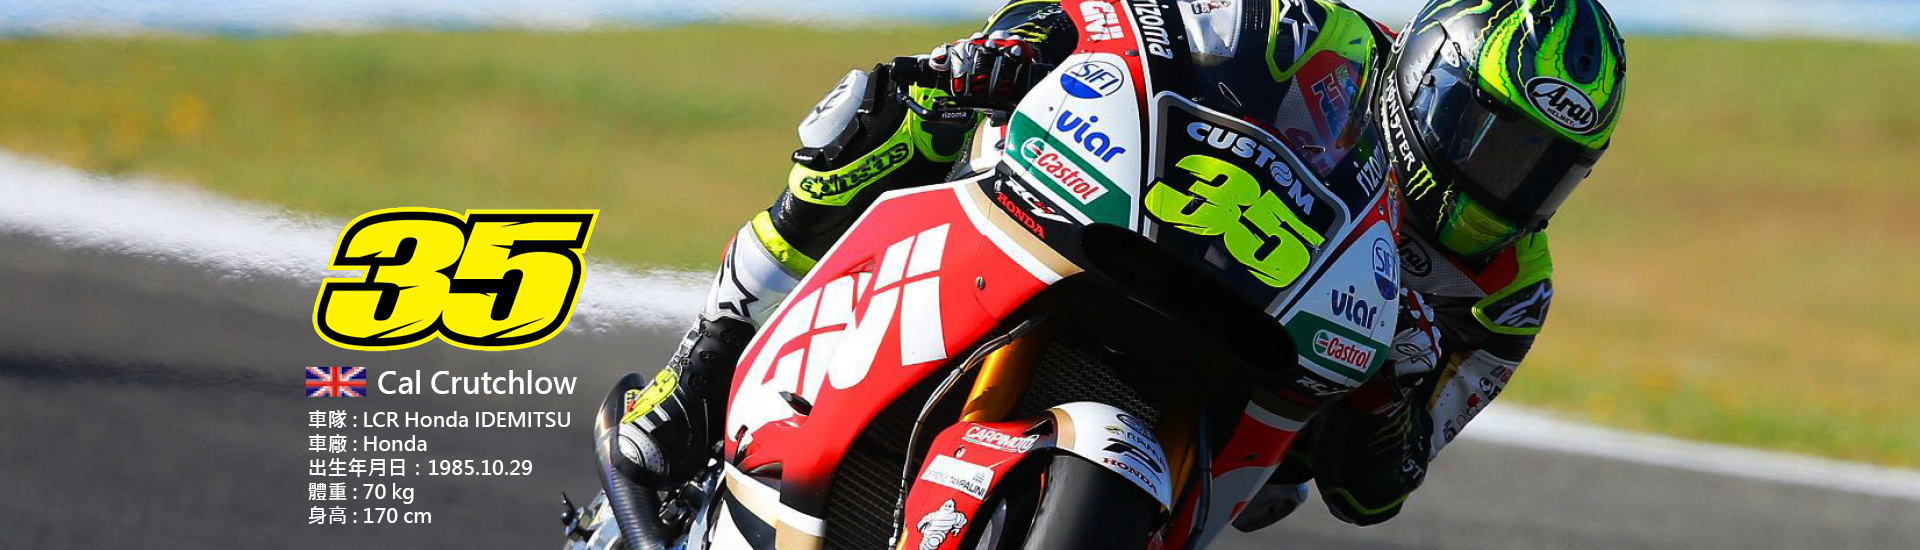 2018 MotoGP 【35】Cal Crutchlow